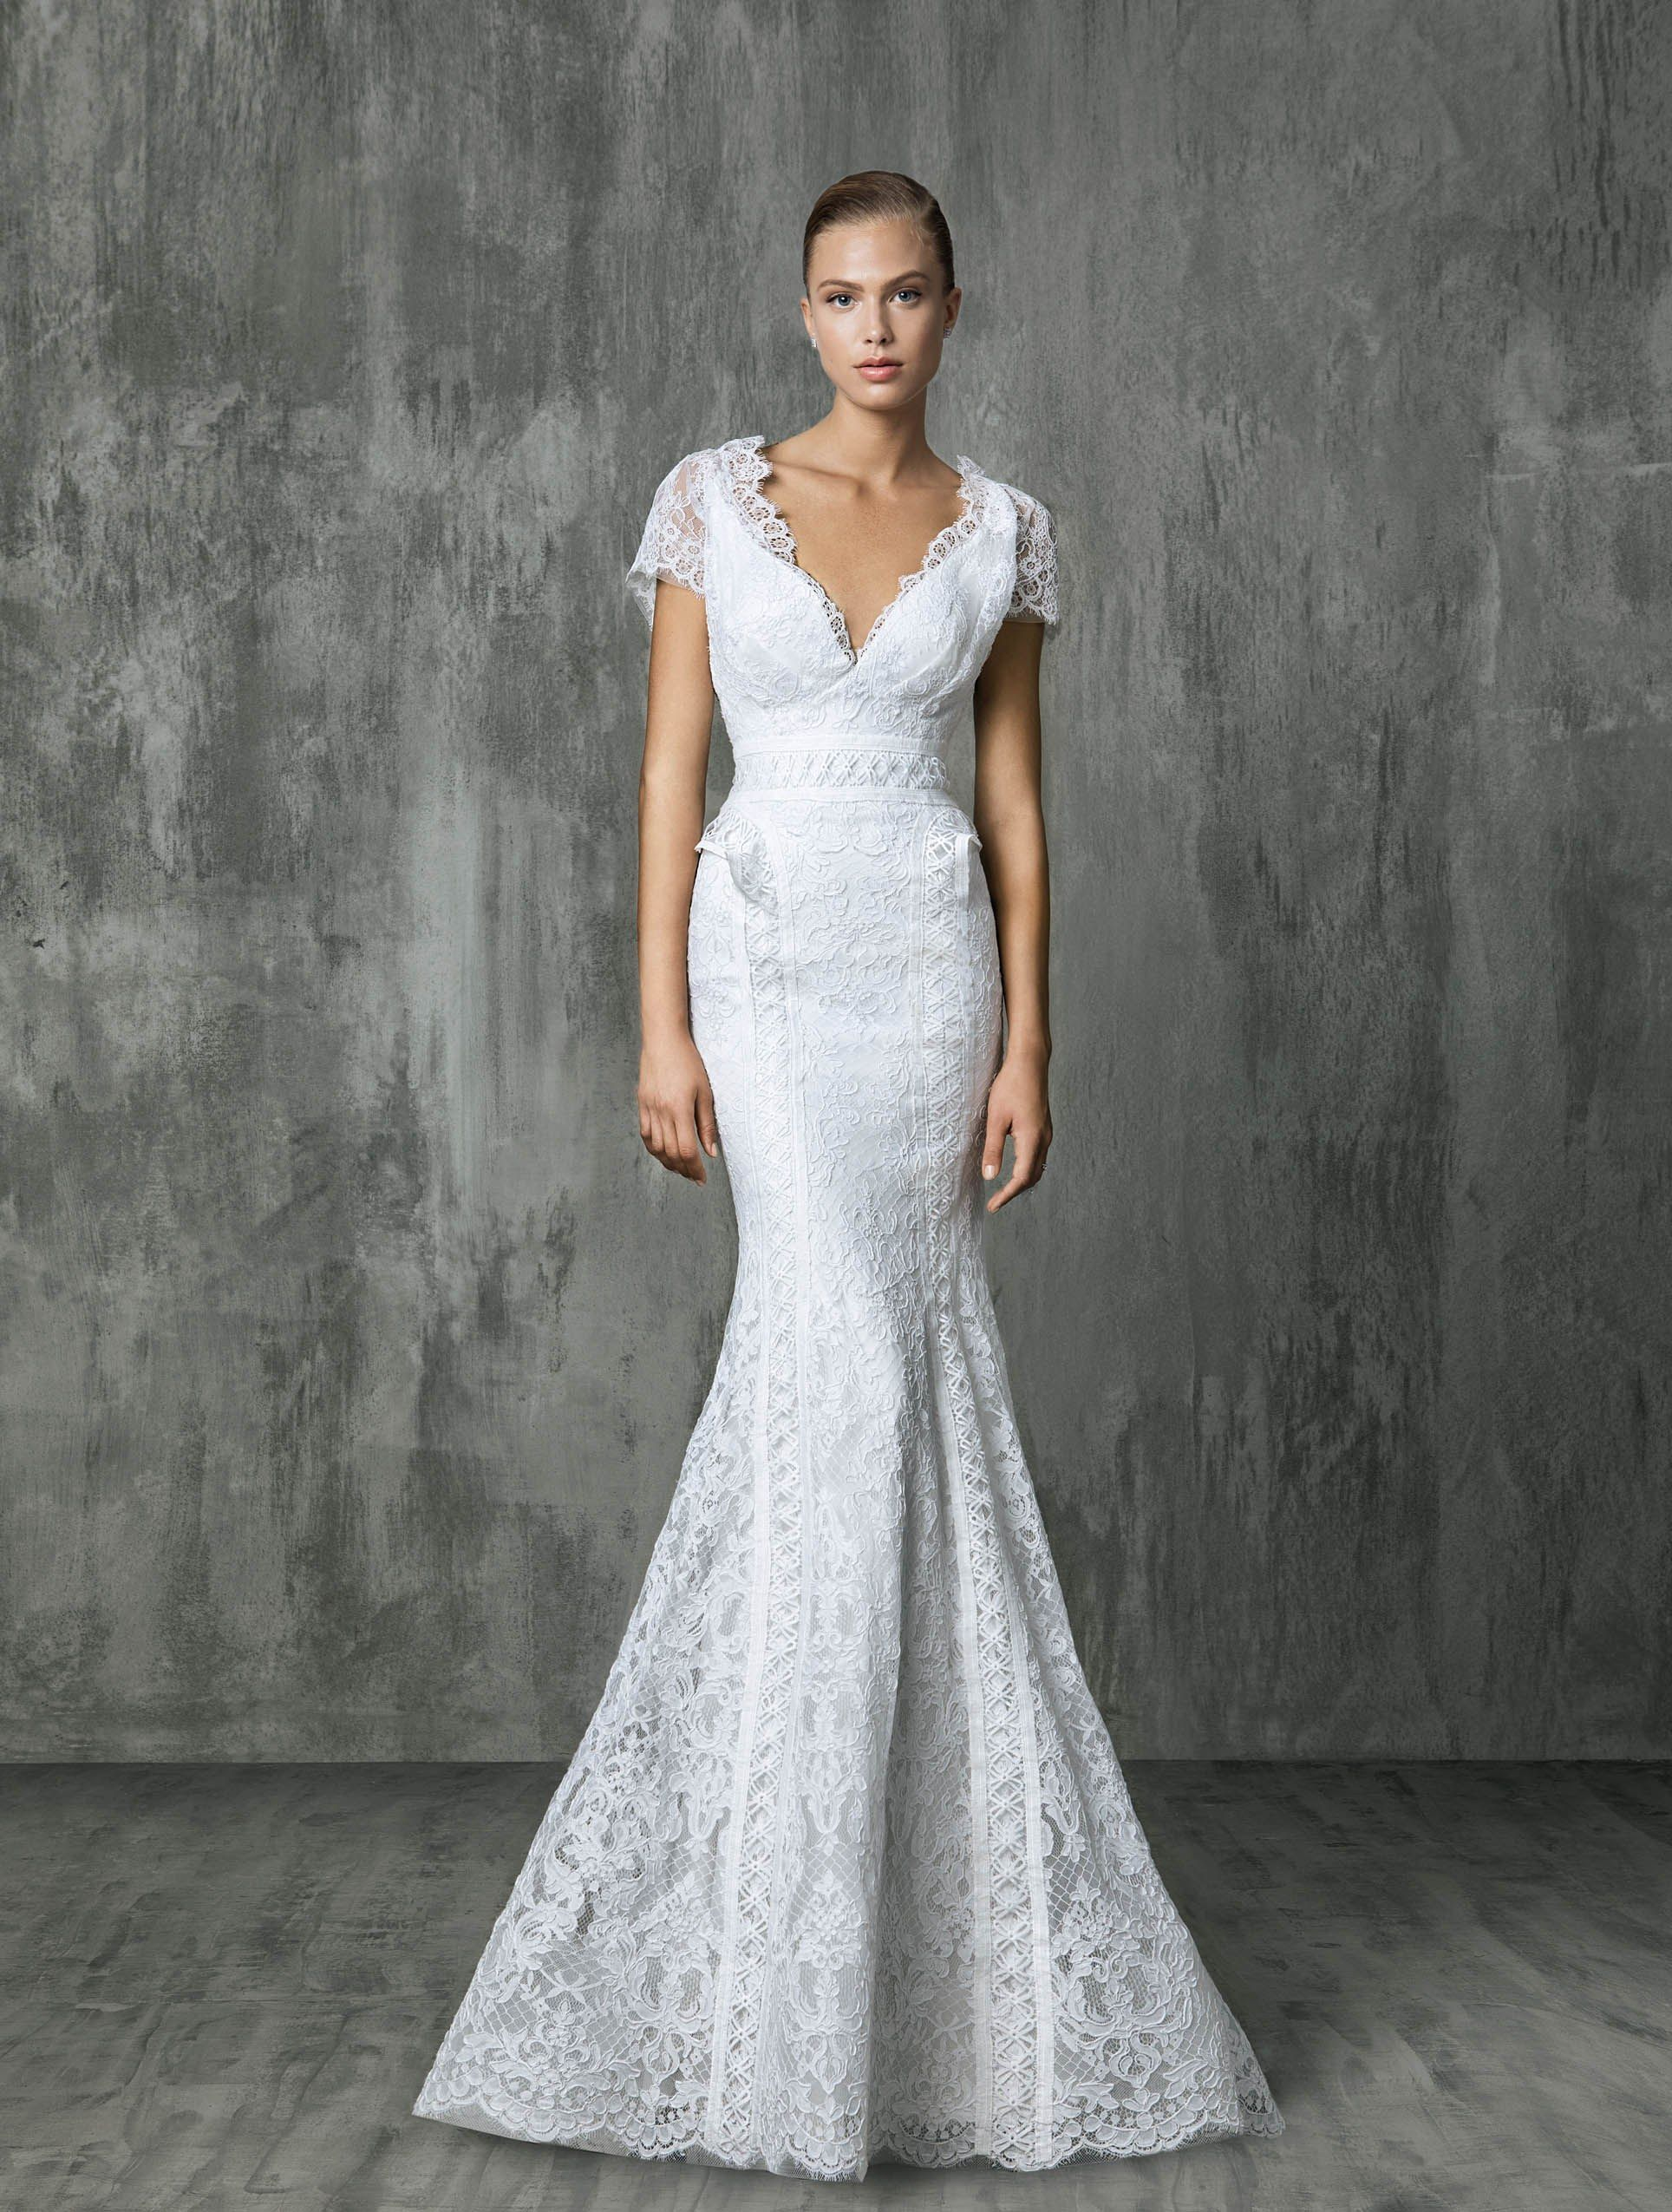 Victoria kyriakides bridal u wedding dress collection fall